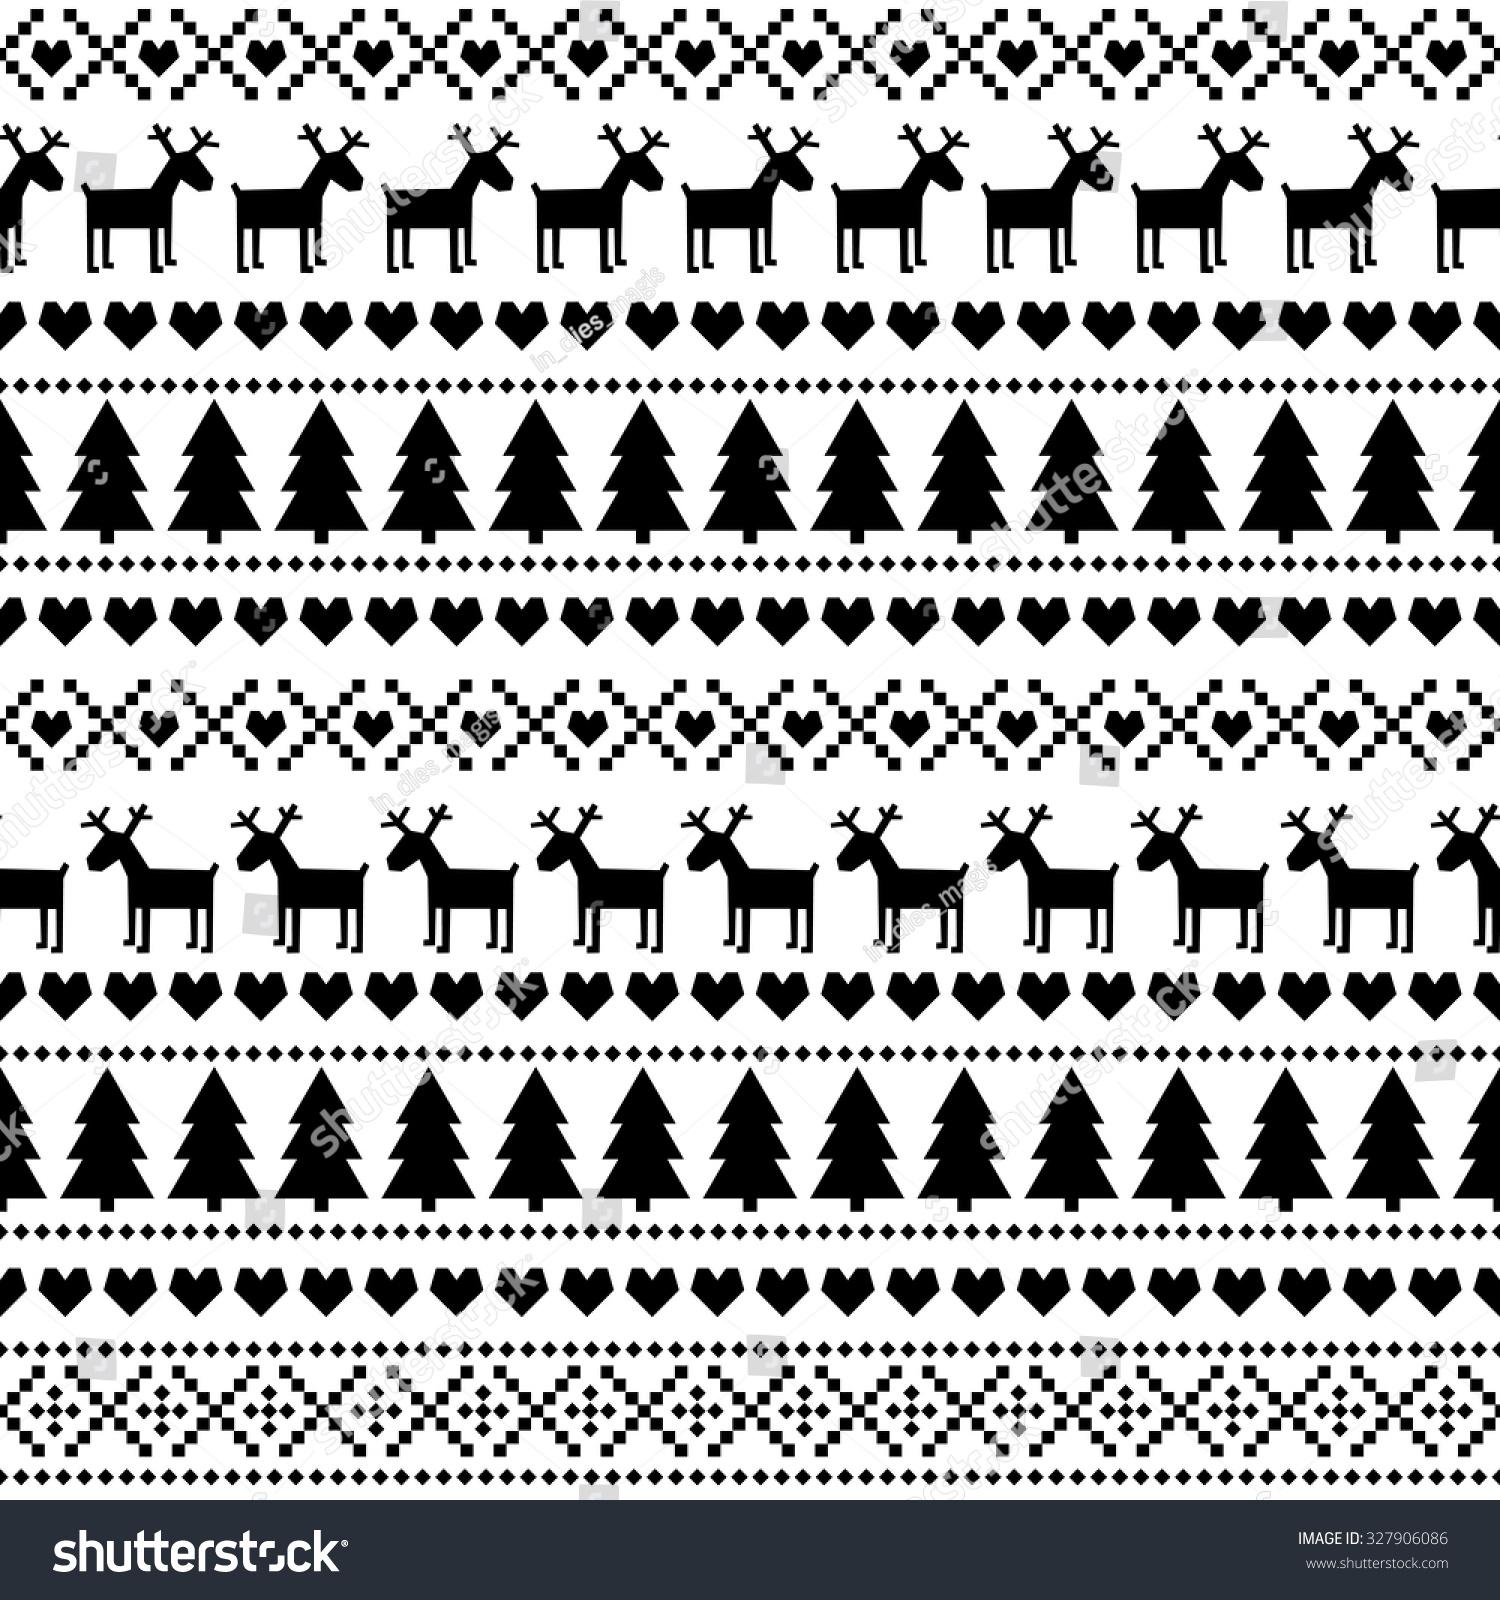 Black White Seamless Christmas Pattern Card Image Vectorielle De